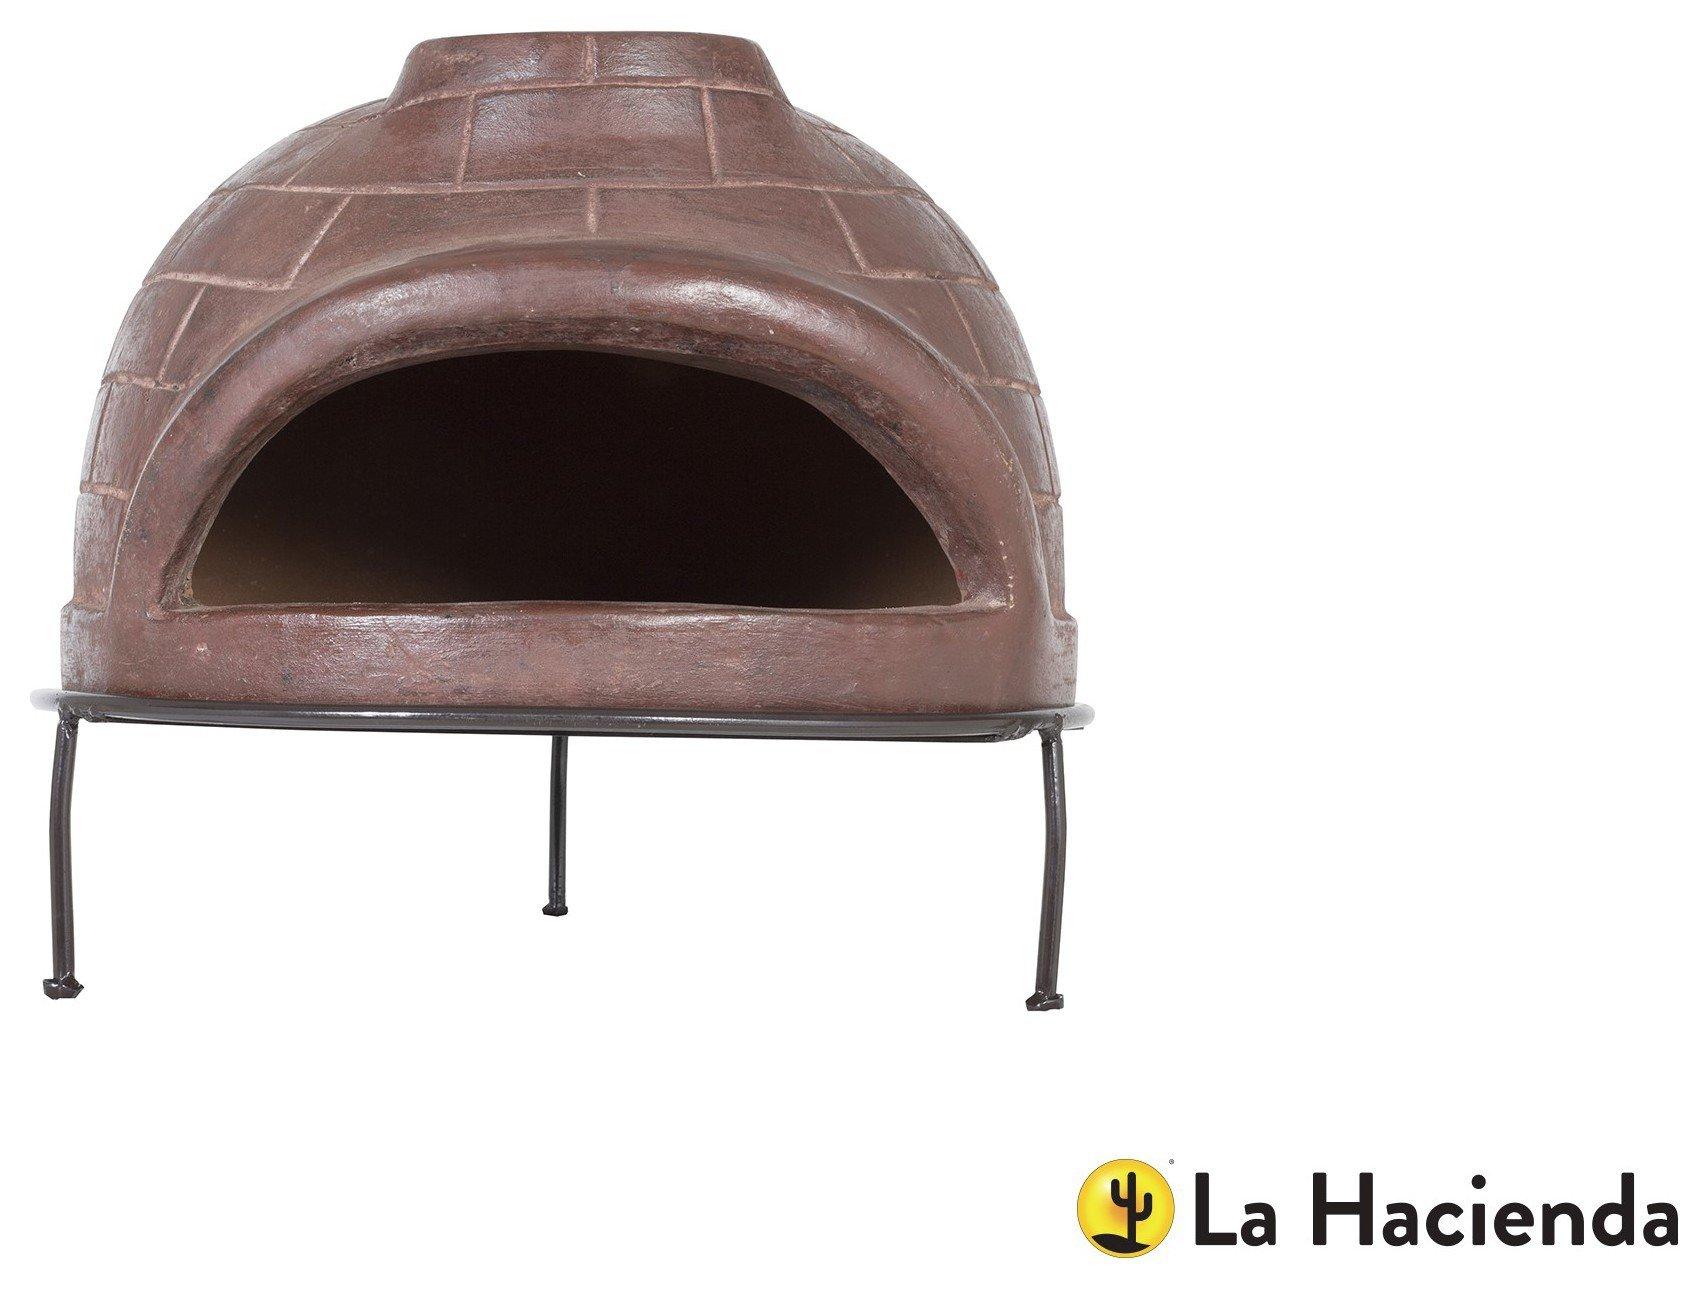 la hacienda designer homeware. Black Bedroom Furniture Sets. Home Design Ideas